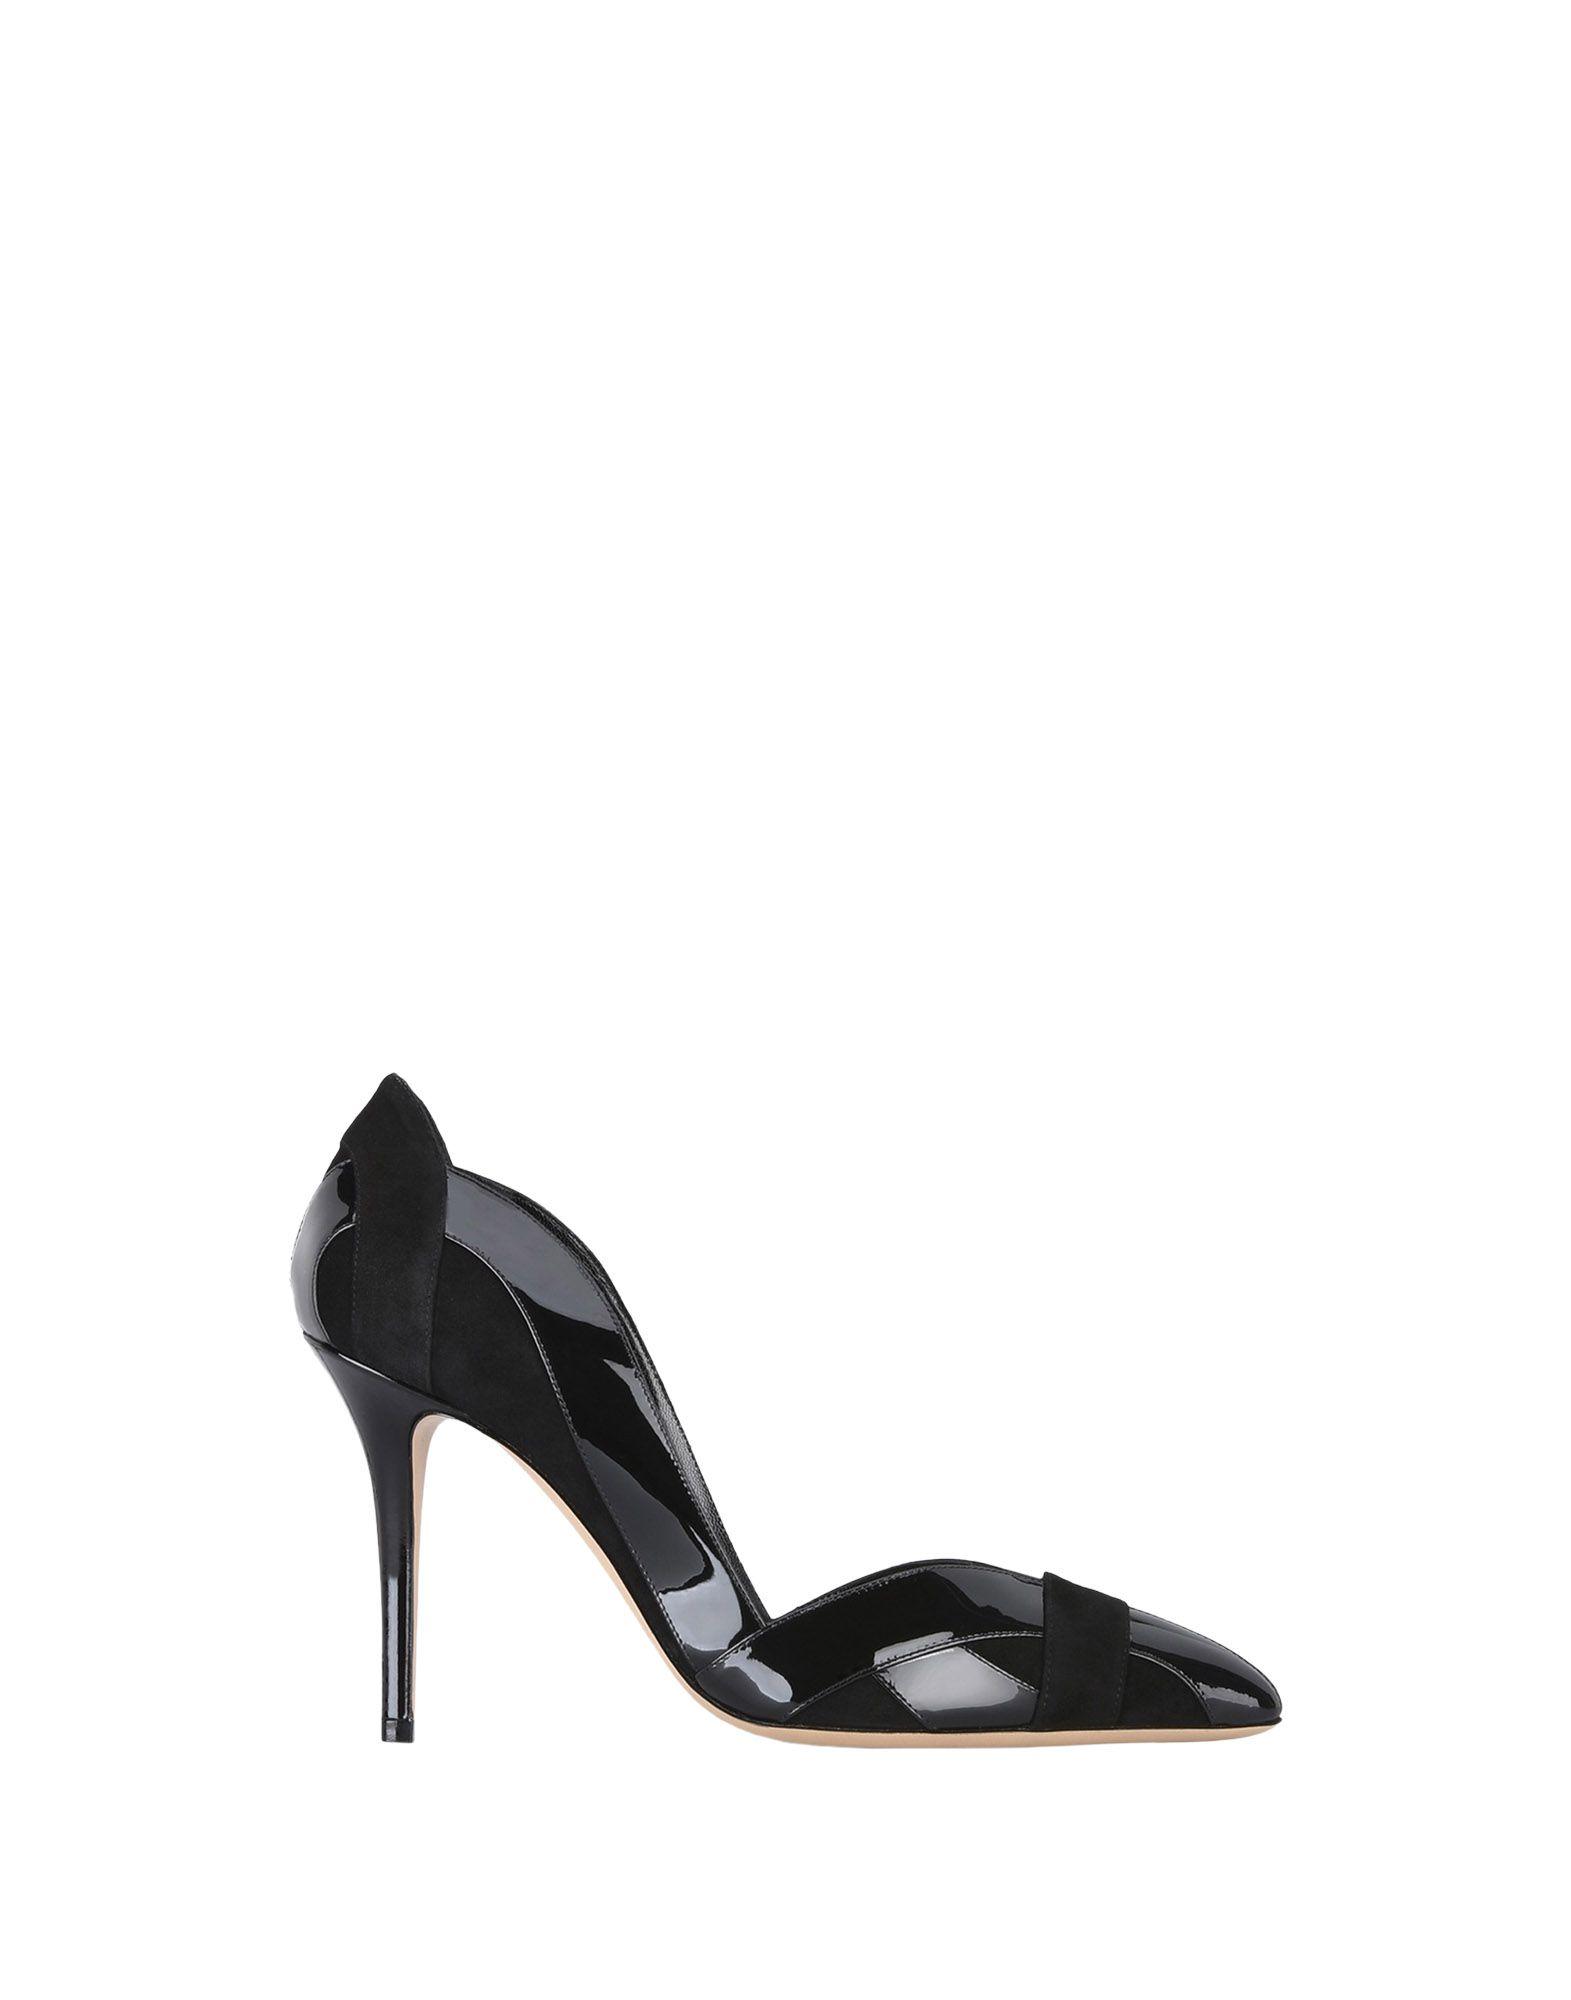 Rabatt Schuhe Schuhe Rabatt Giorgio Armani Pumps Damen  11443570XT b9ecfb